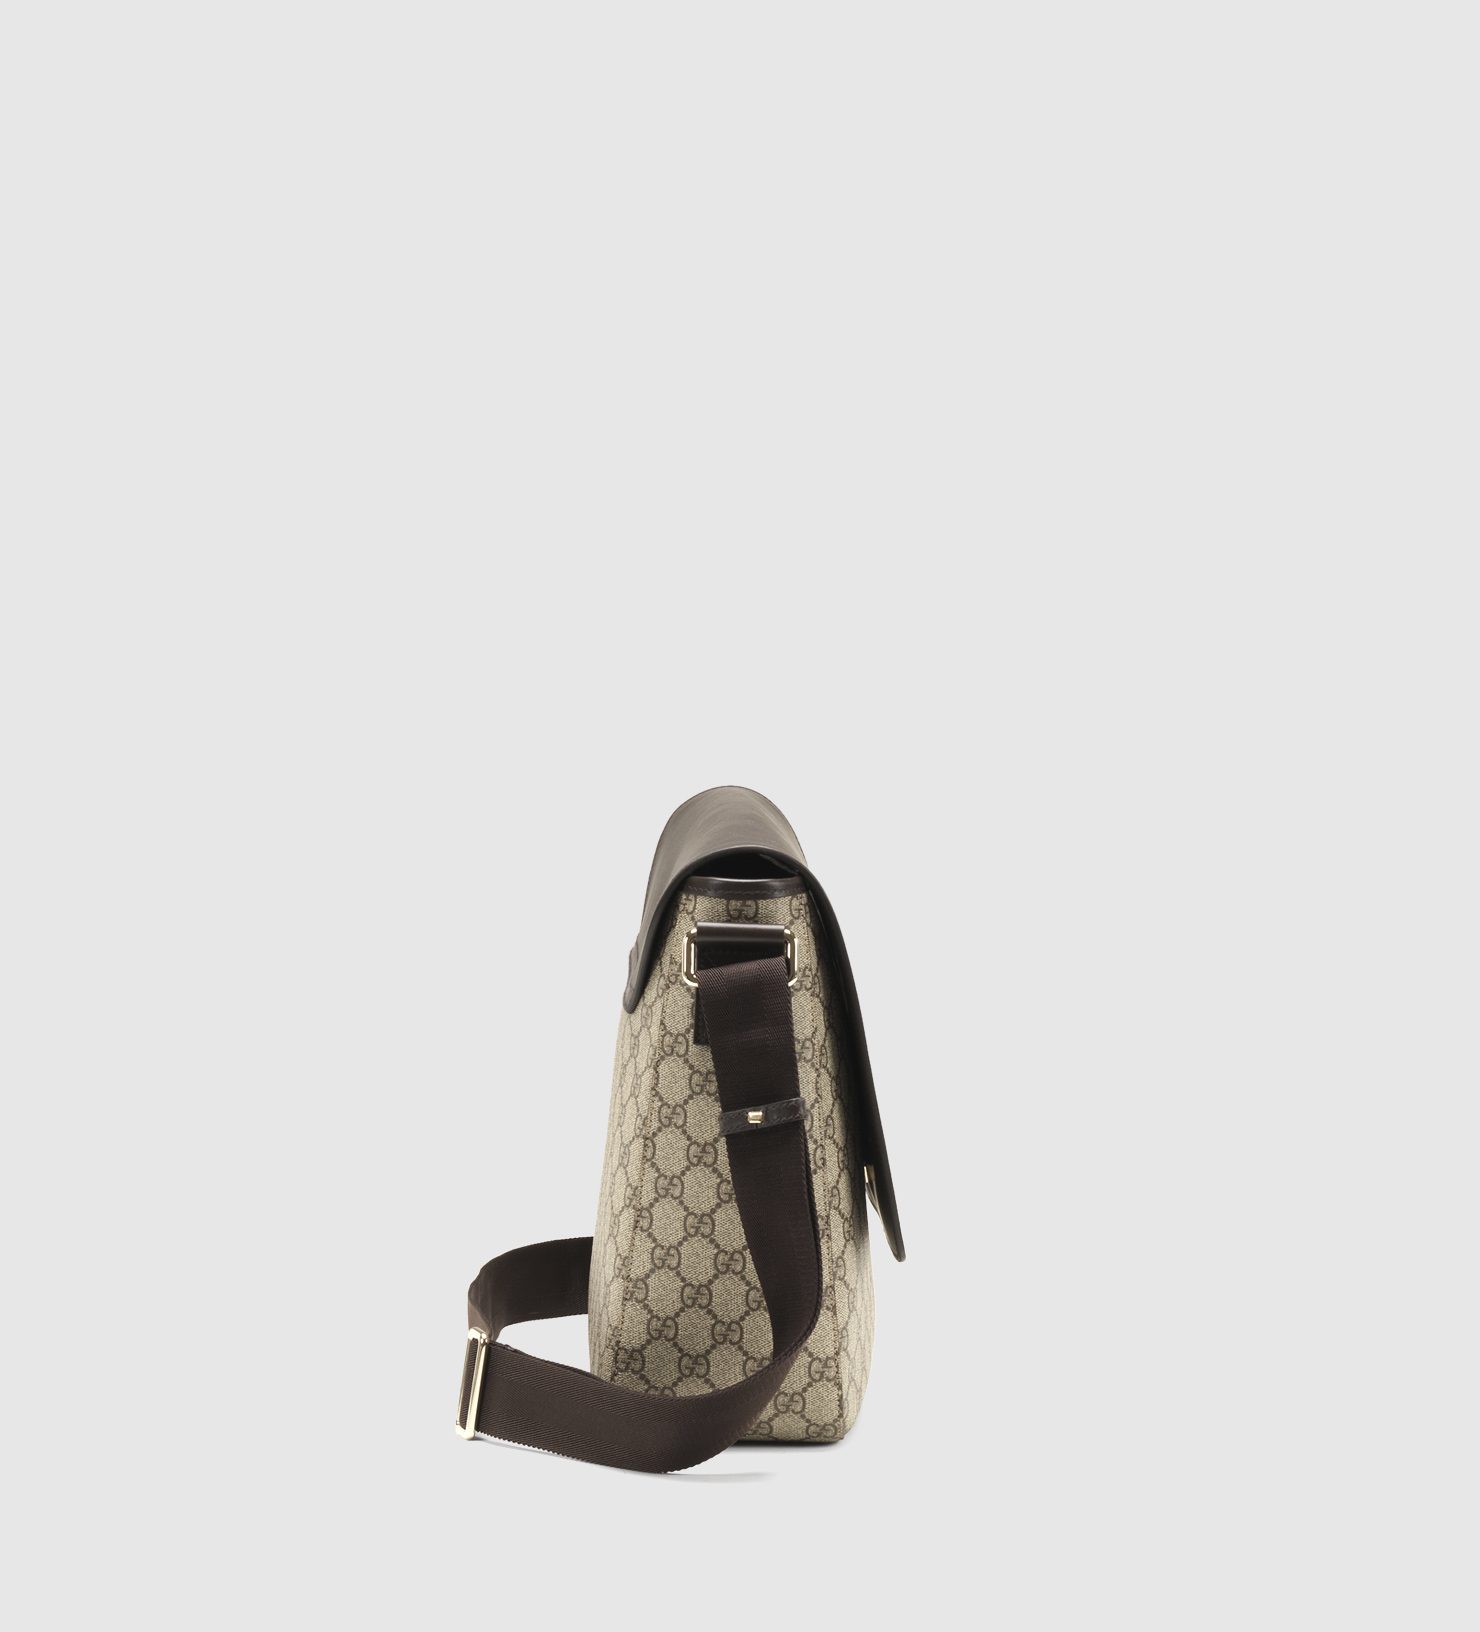 9332cfa8d48 Lyst - Gucci Gg Supreme Canvas Messenger Bag in Brown